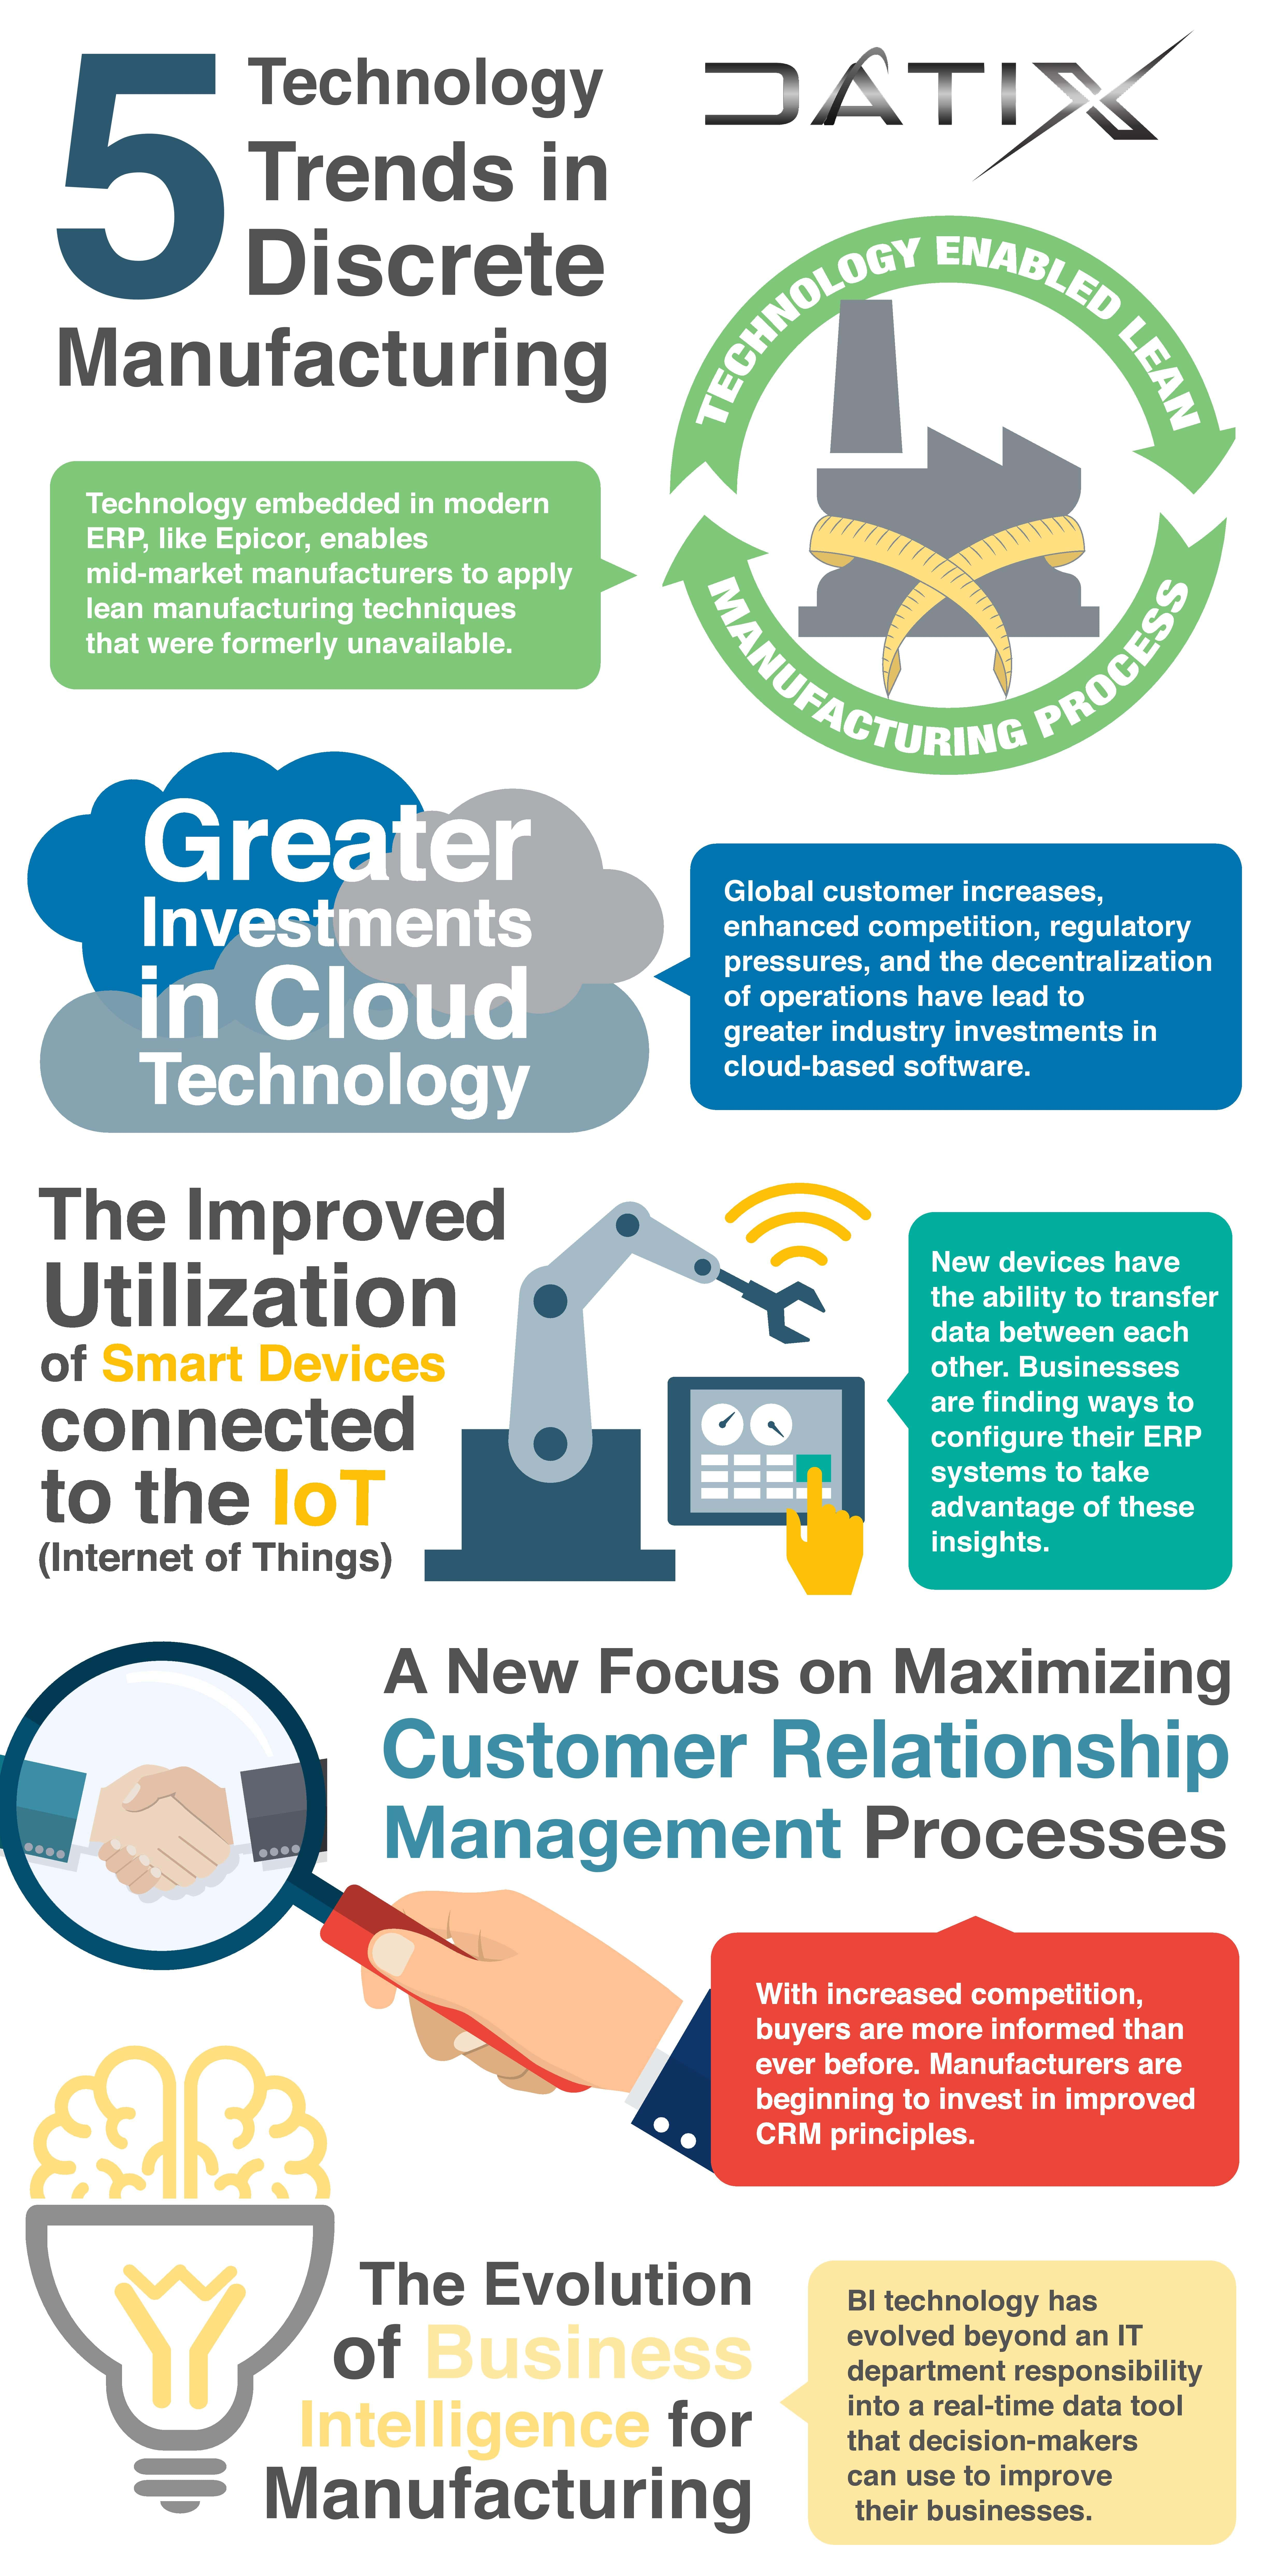 Discrete Manufacturing Trends Infographic